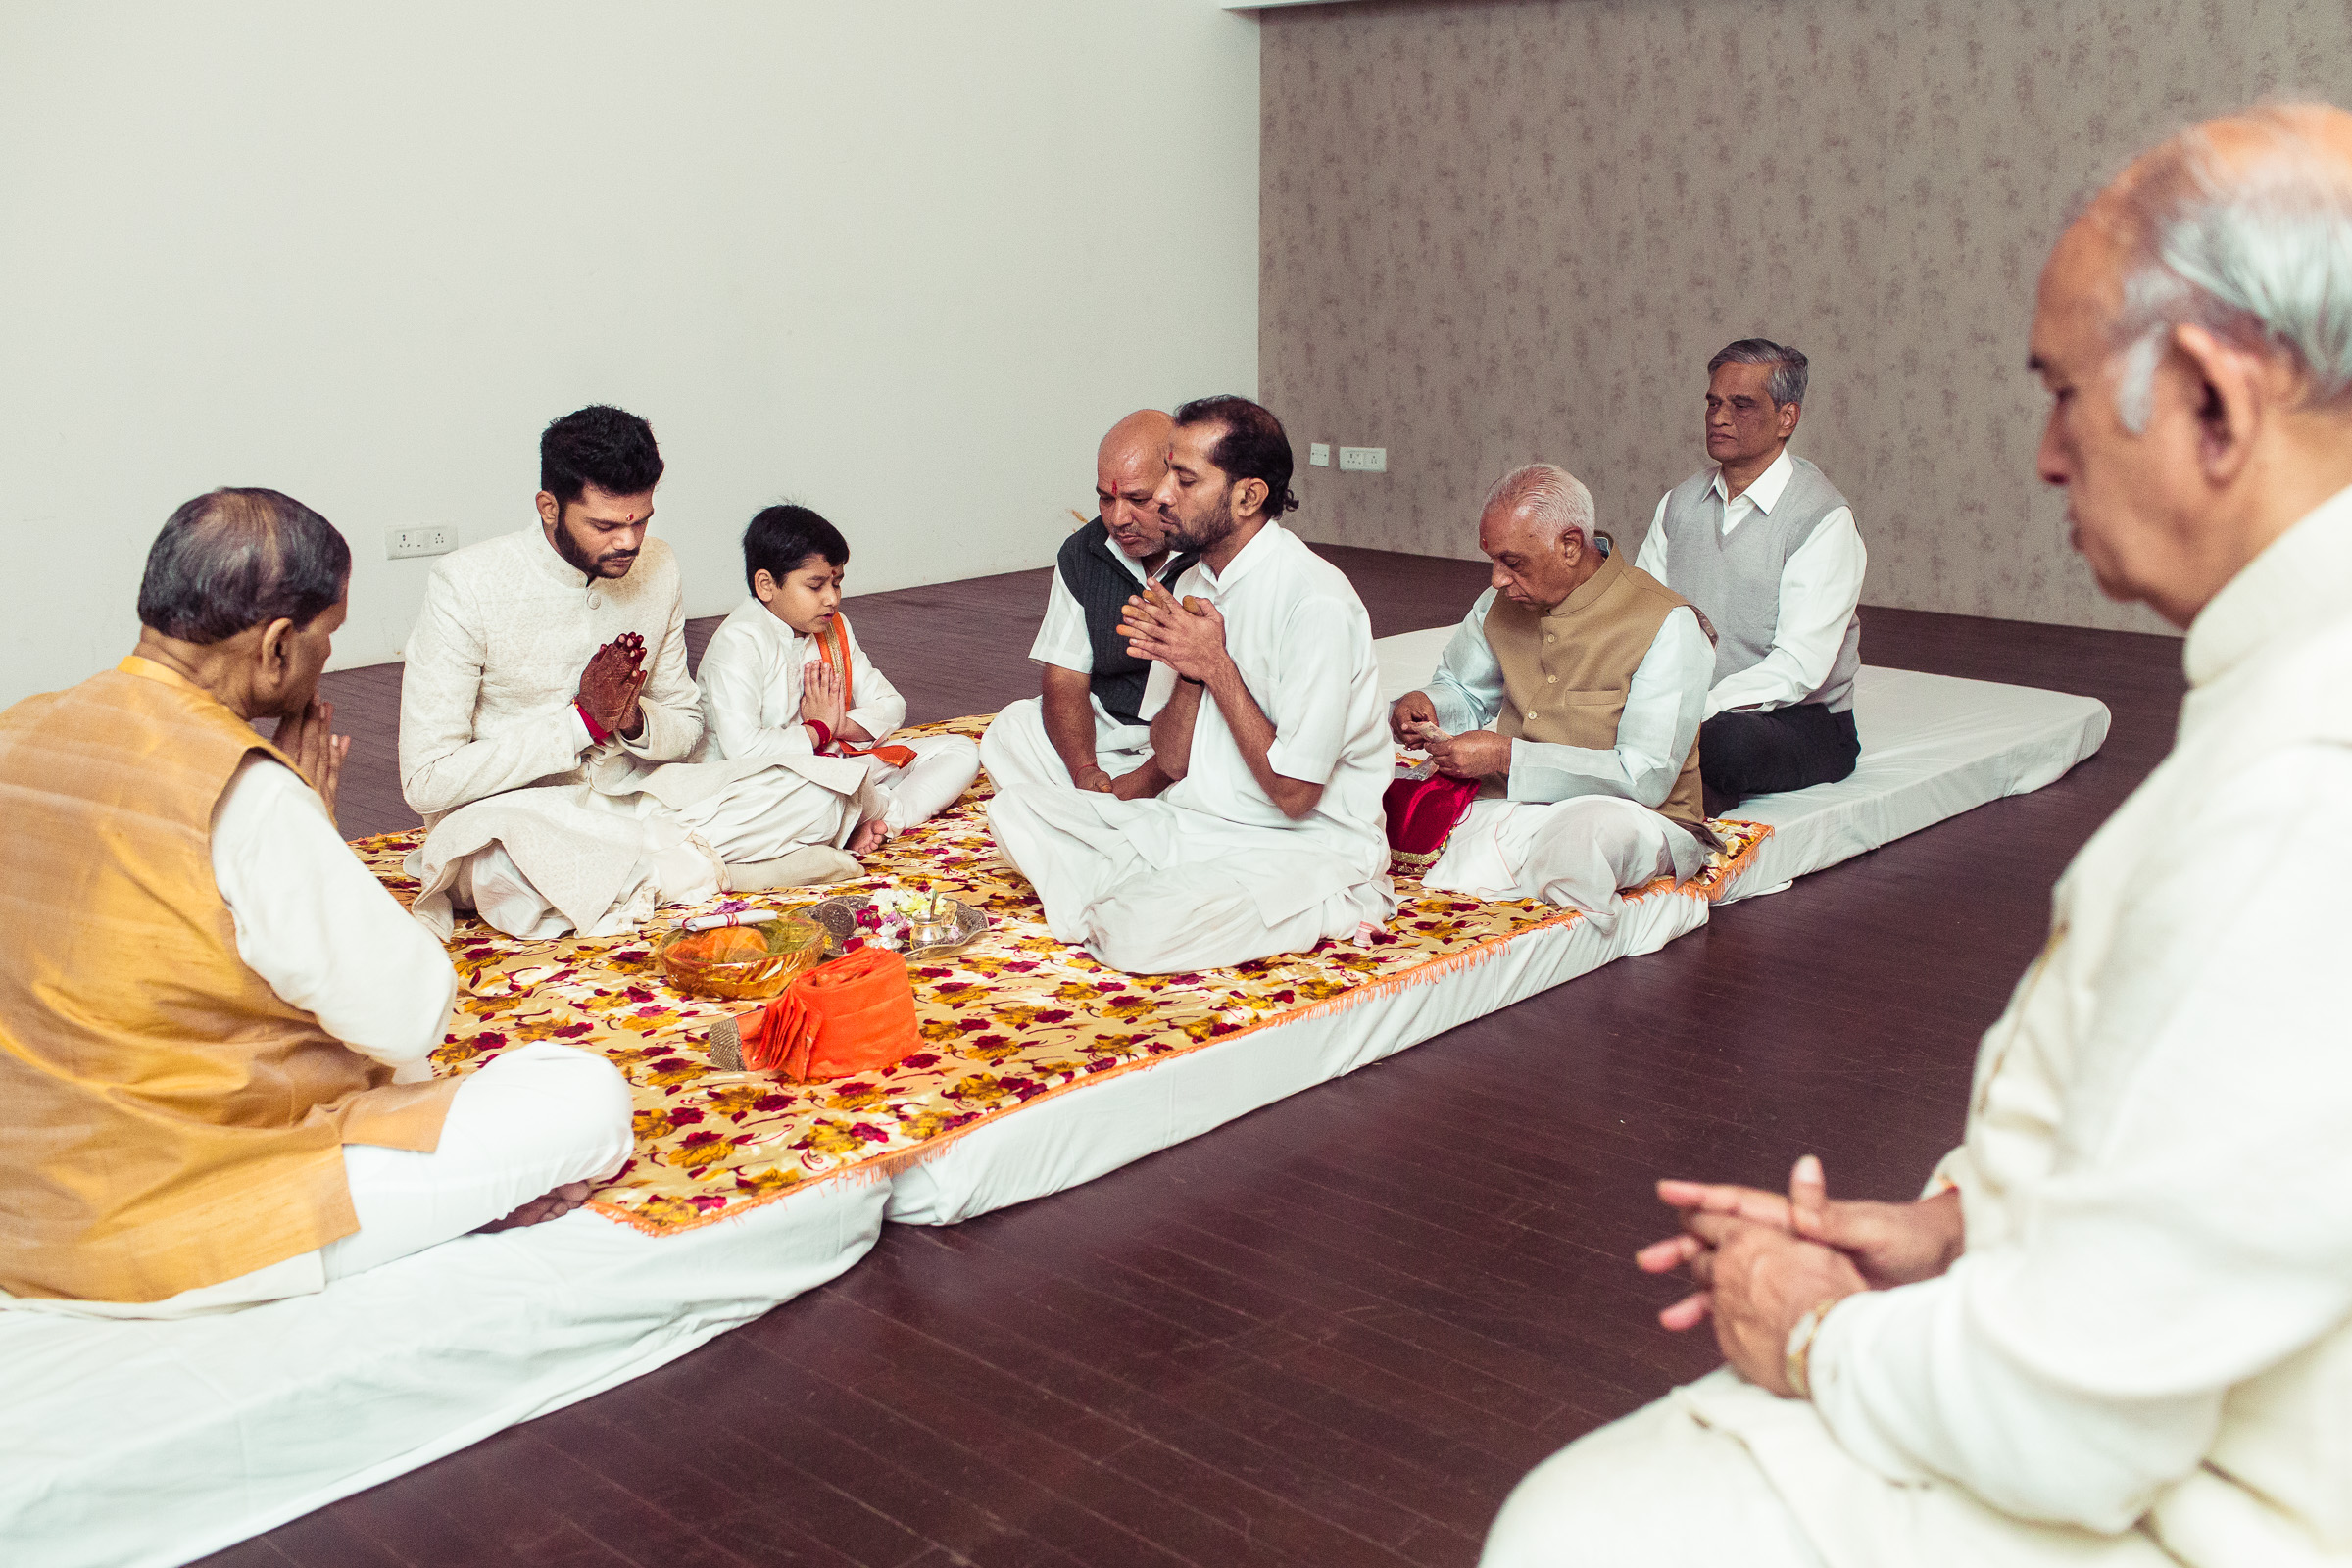 marwari-candid-wedding-photographers-bangalore-0005.jpg